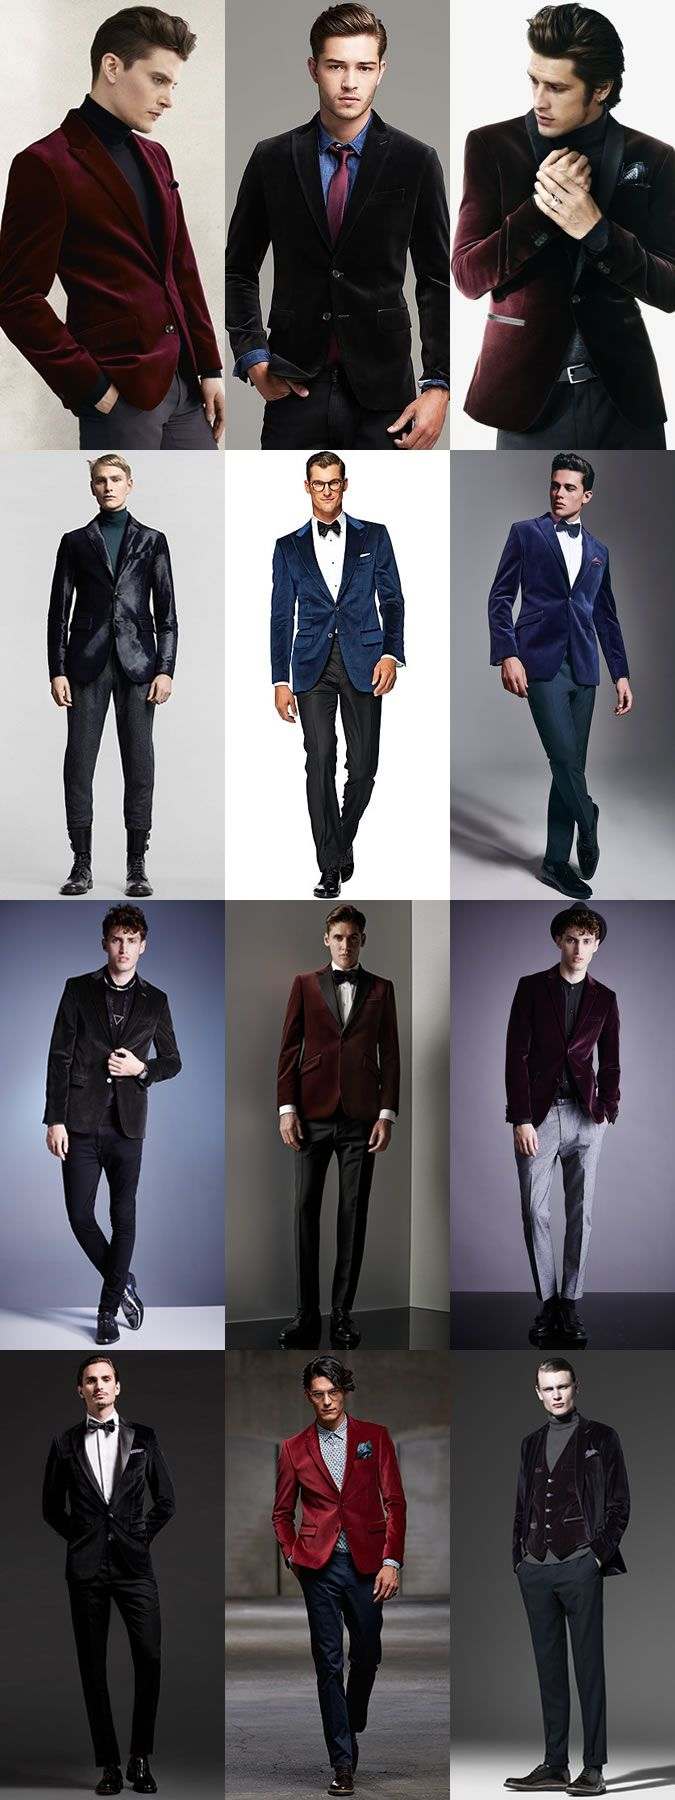 //Men's Velvet Blazer Outfit Inspiration Lookbook #fashion #menswear